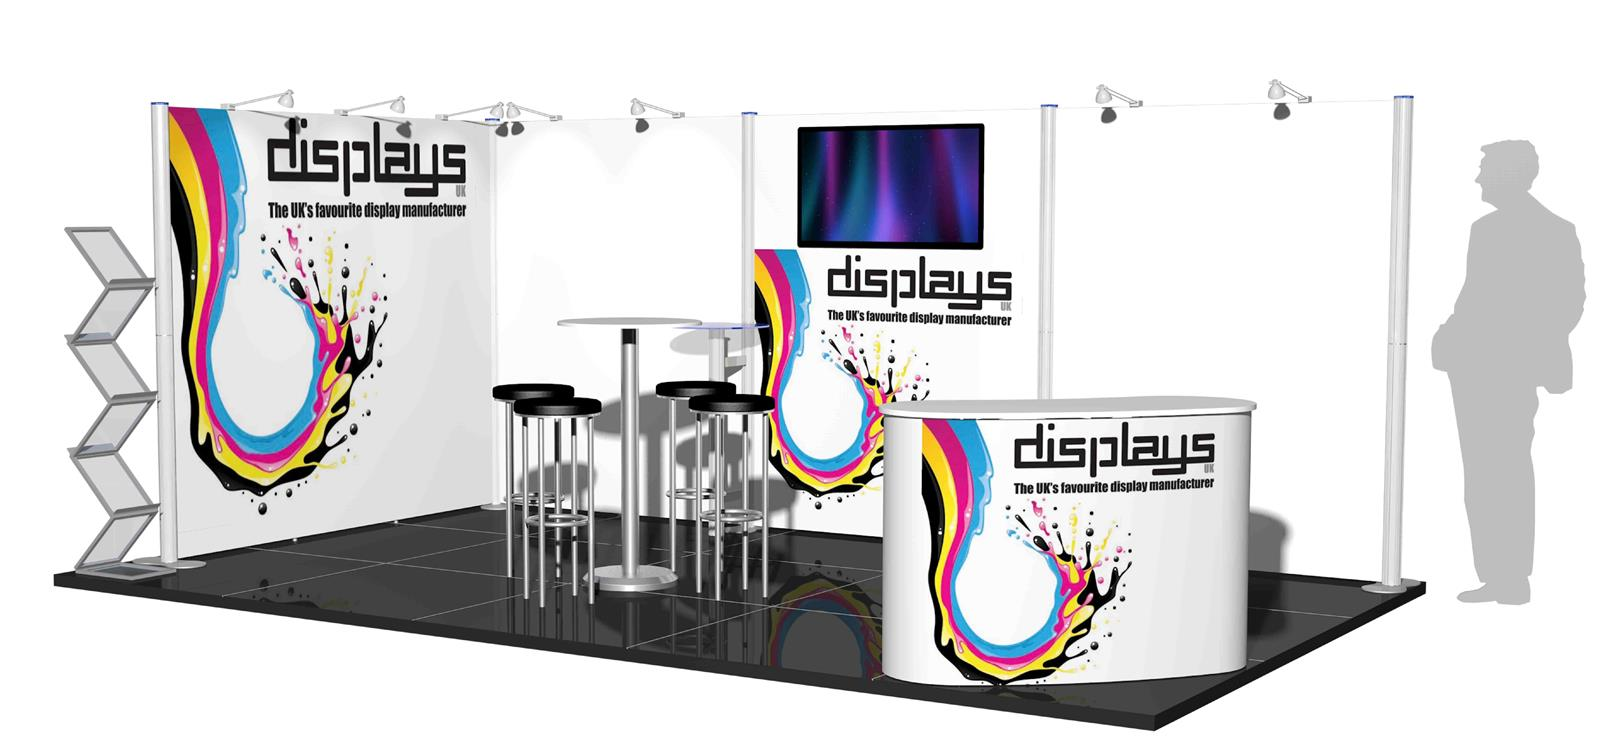 Centro 5x3 Modular Exhibition Stand - C5x3-2a